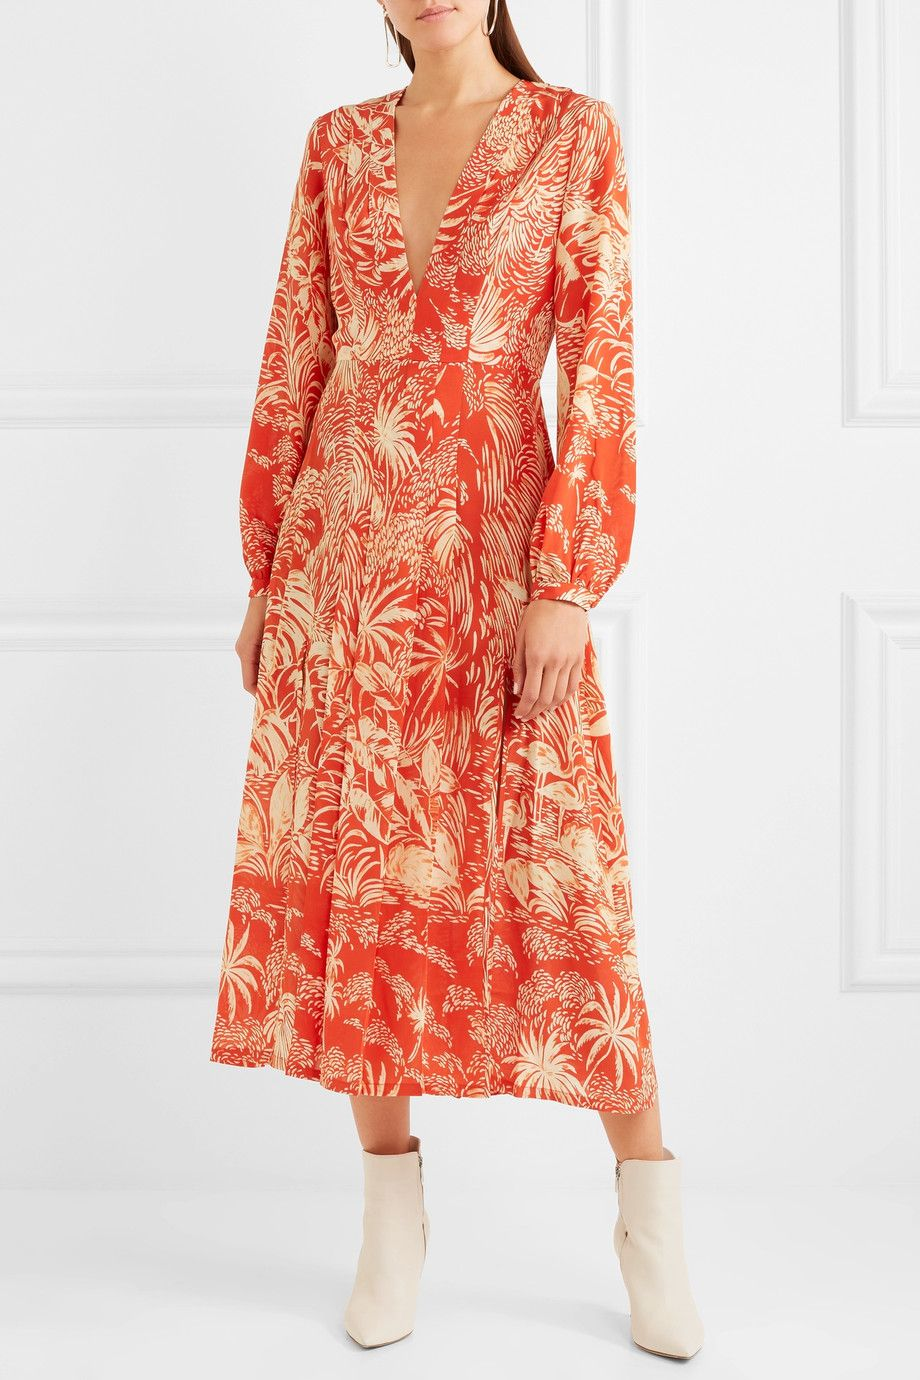 RIXO London | Camellia pleated printed silk crepe de chine midi dress |  NET-A-PORTER.COM